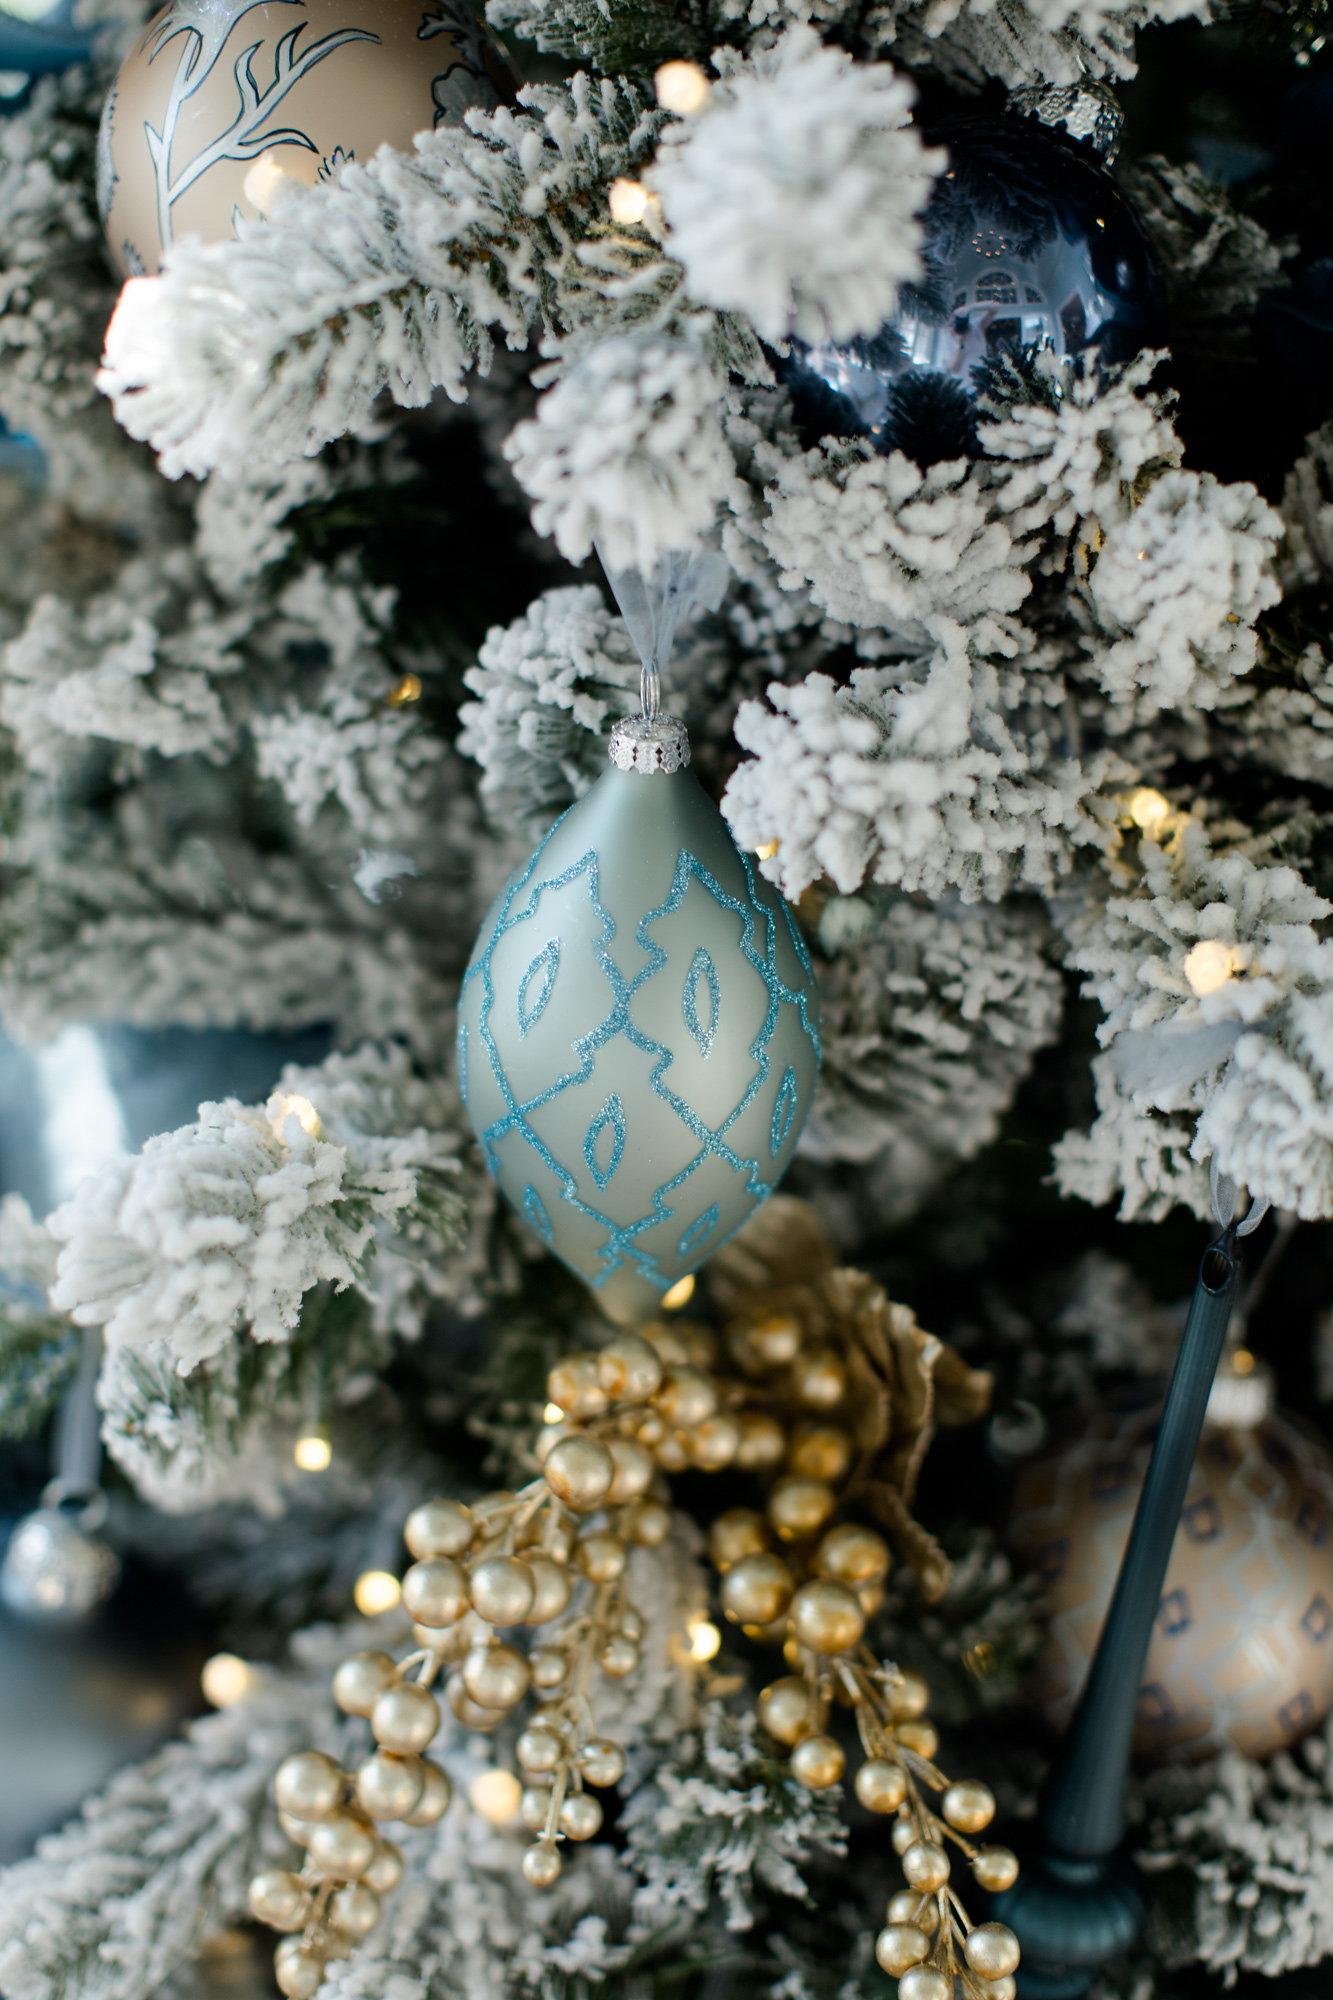 Frontgate ornaments